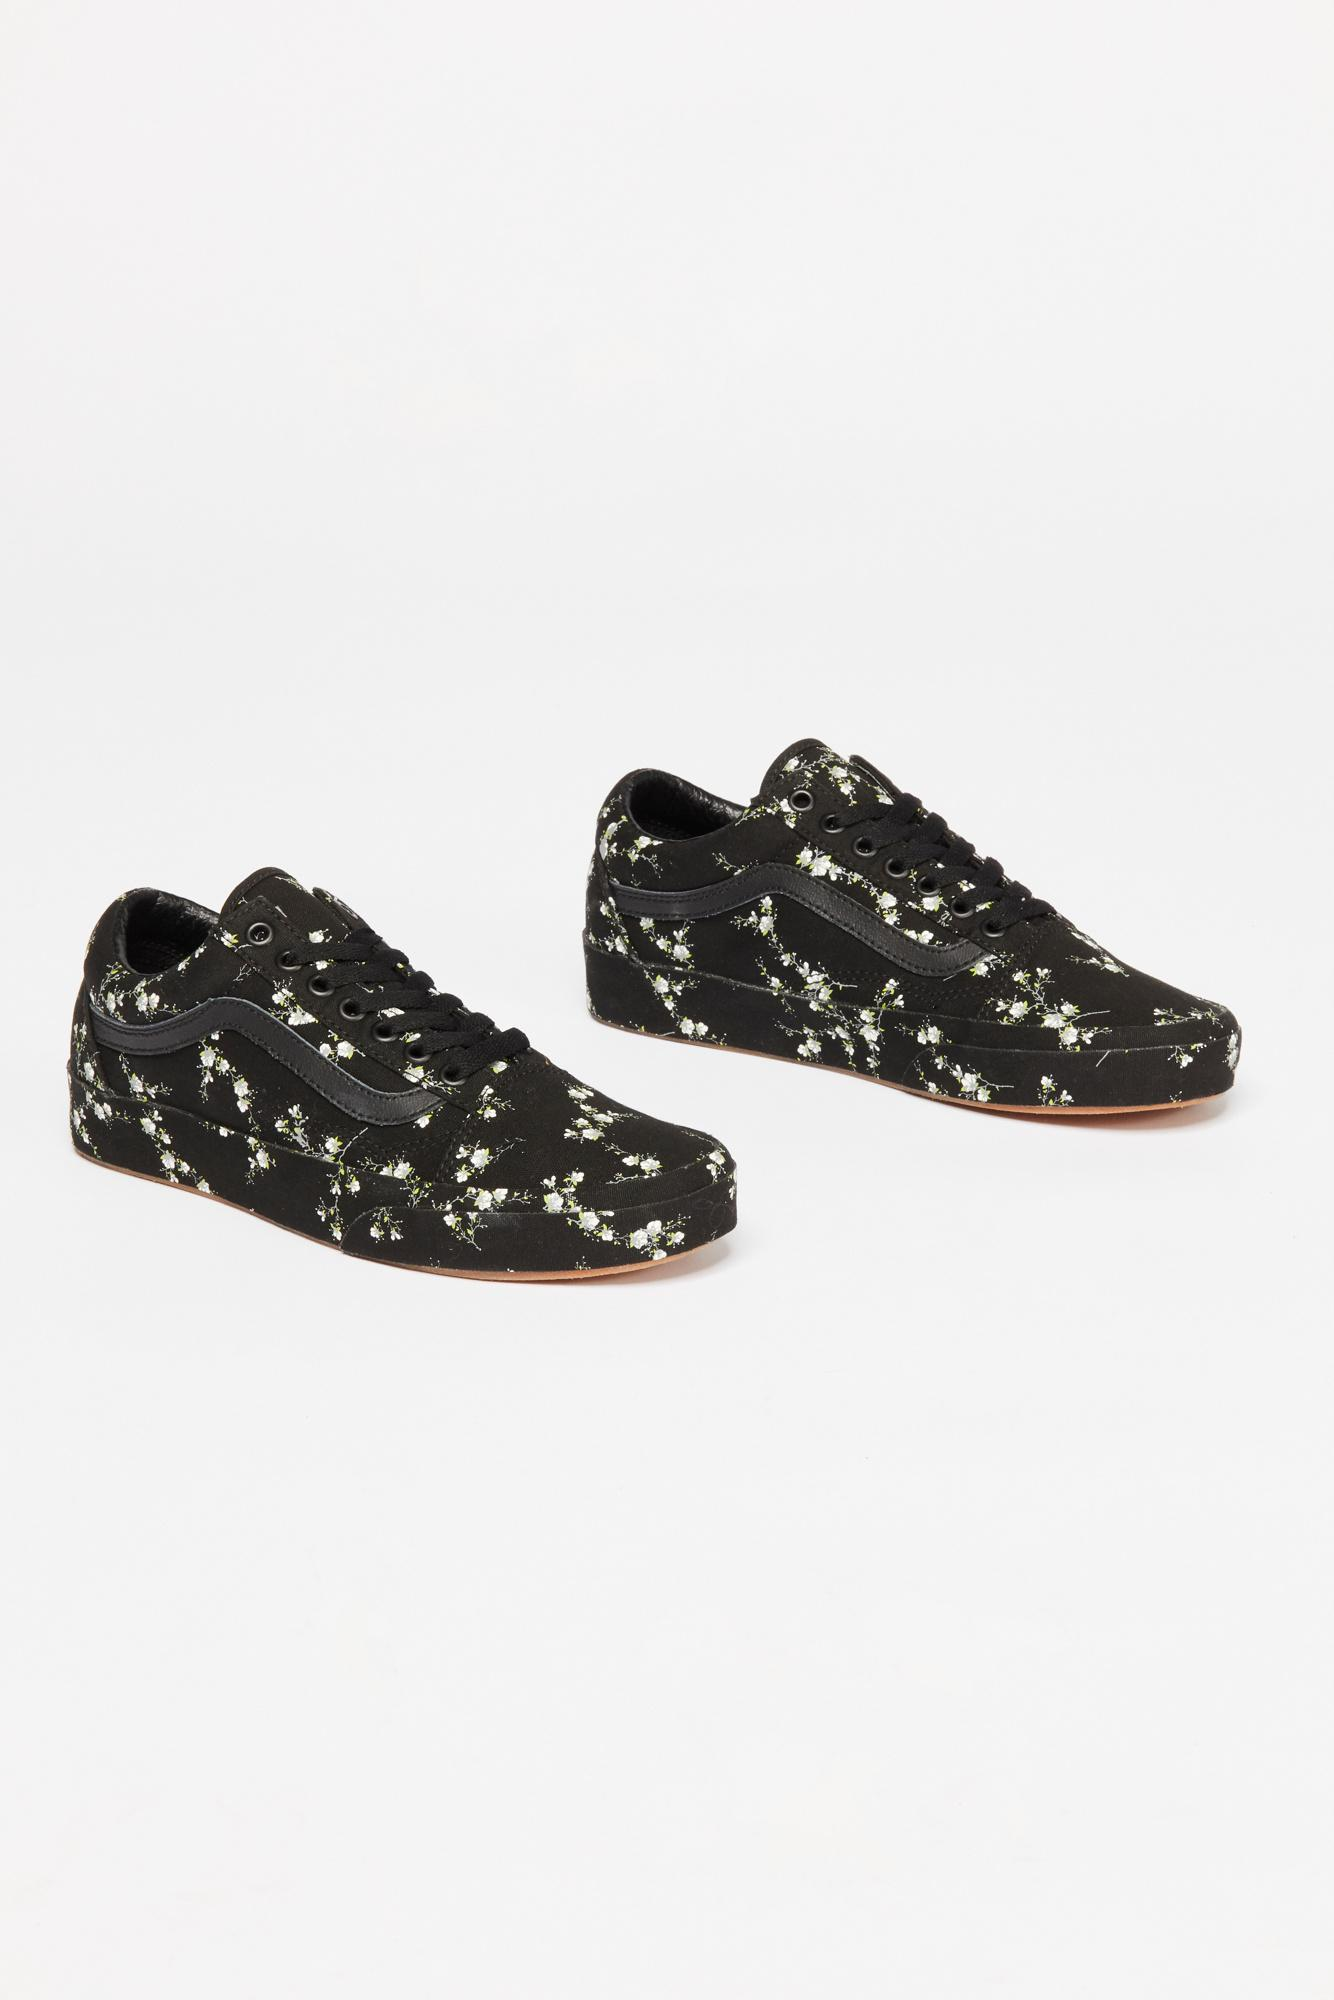 26dcc9d784f7 Free People Old Skool Midnight Floral Sneaker in Black - Lyst